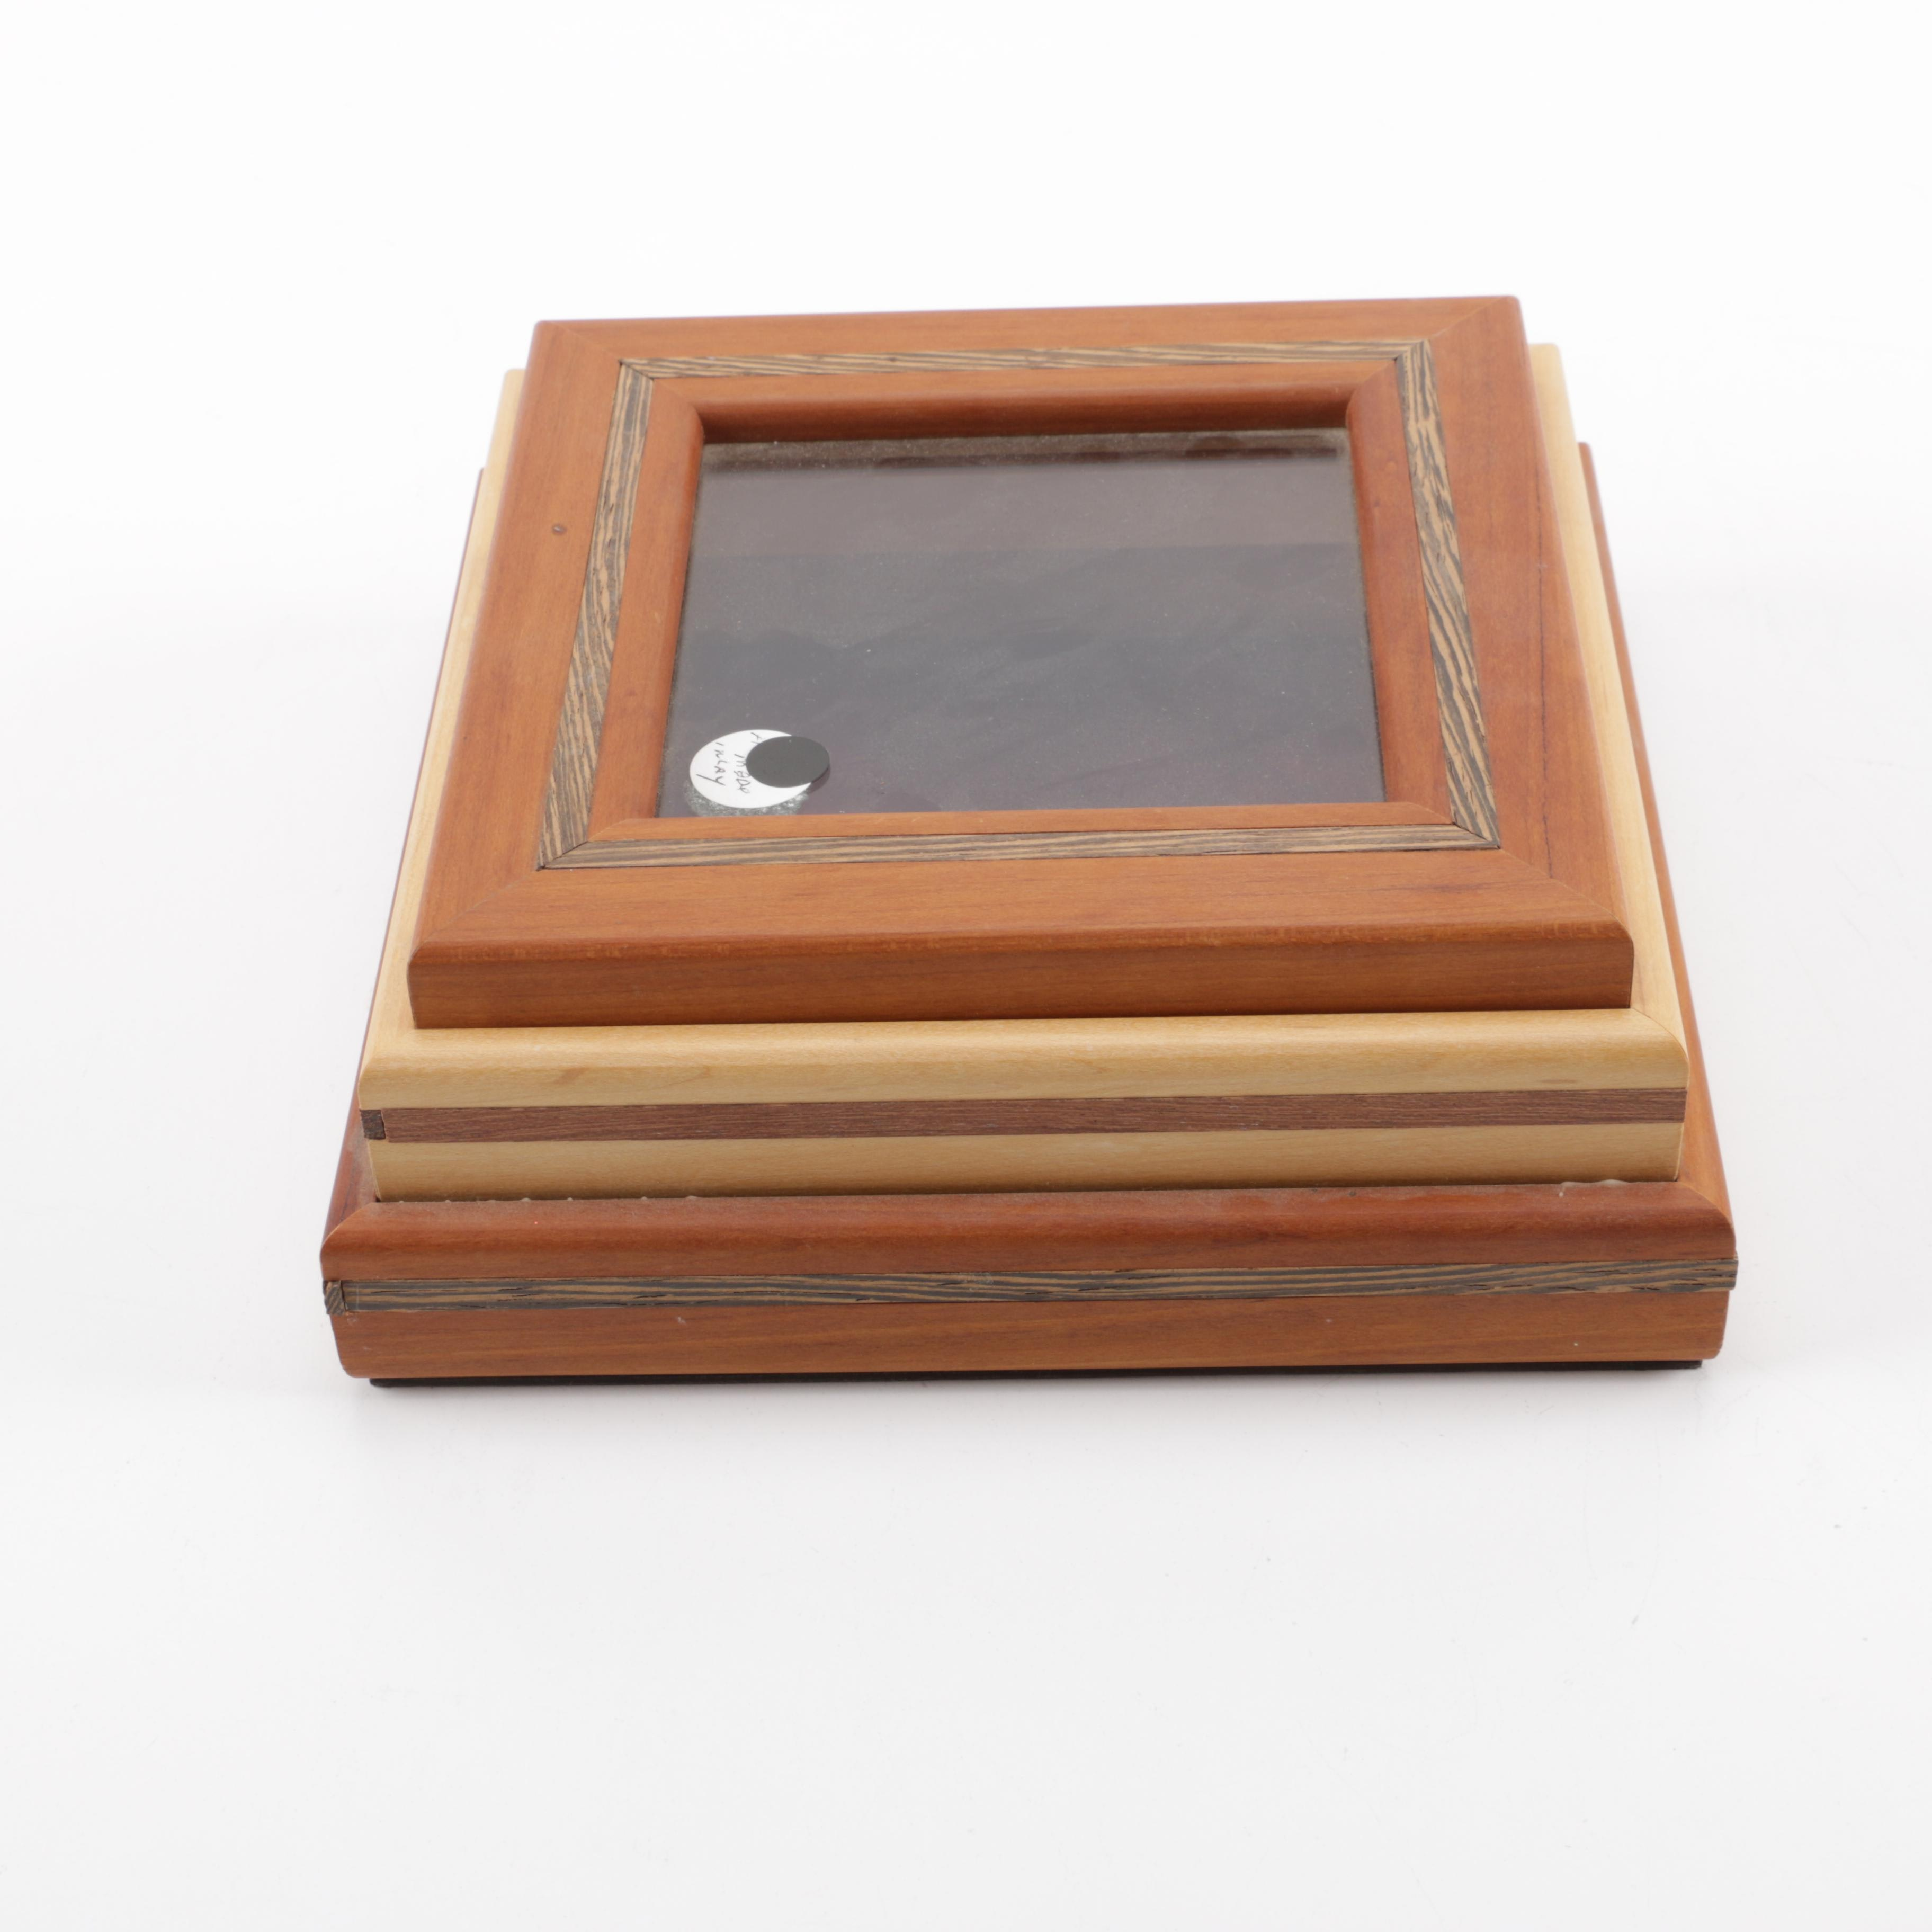 Wooden Trinket Display Box